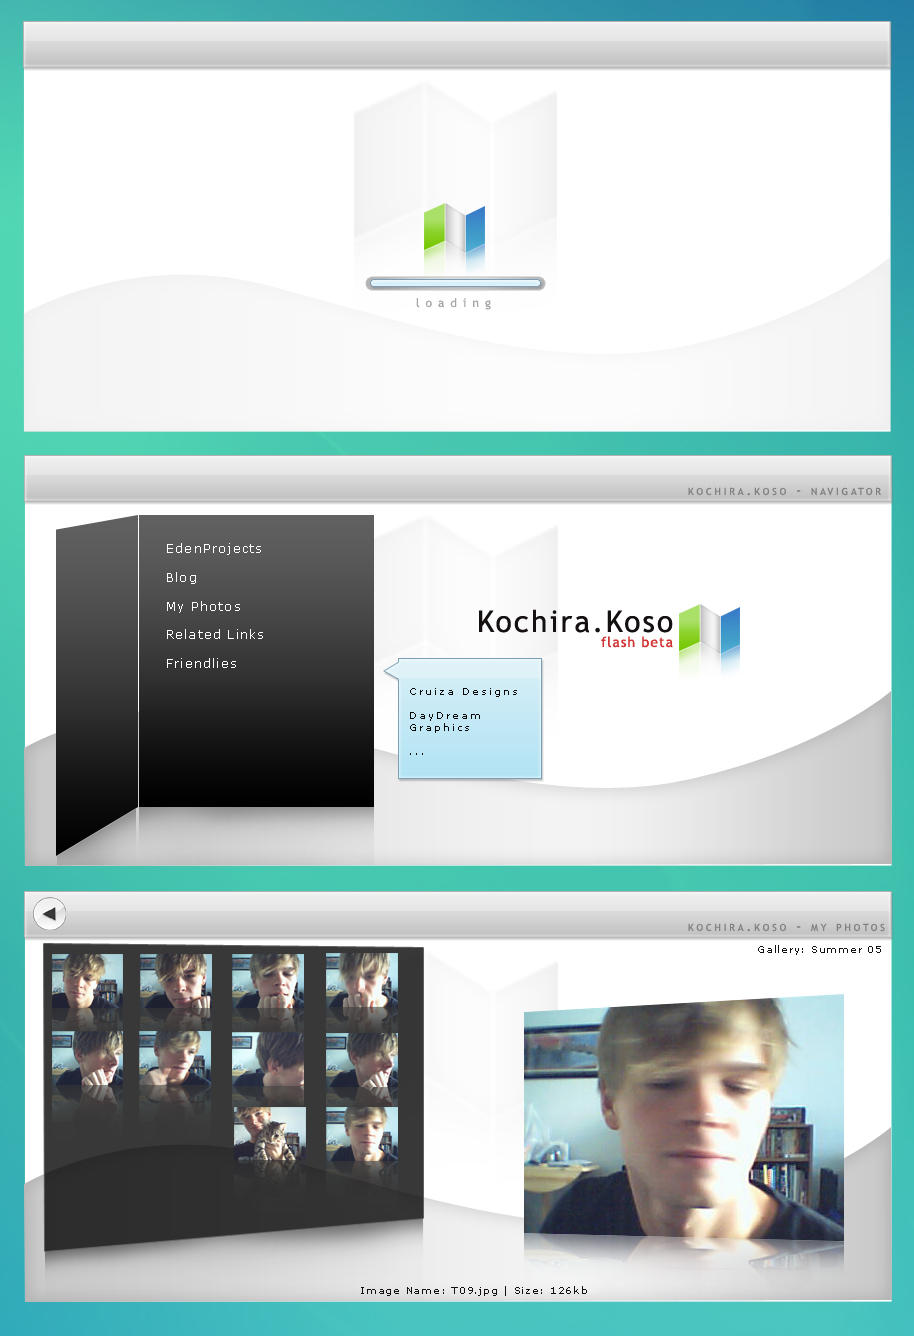 Kochira Koso Flash Beta Prev by edenprojects